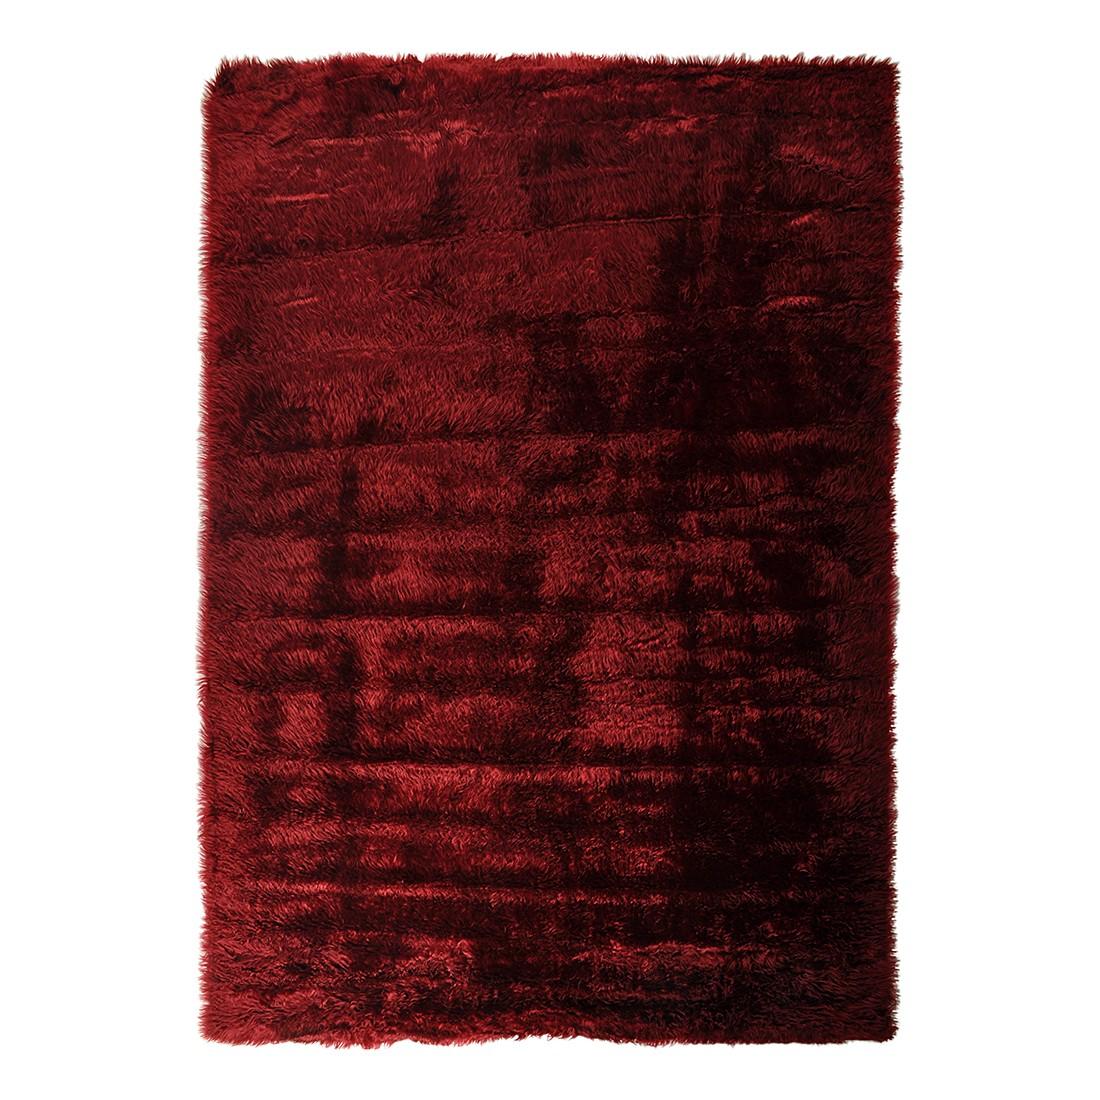 teppich cuneco ii rot 160 x 230 cm hanse home collection g nstig bestellen. Black Bedroom Furniture Sets. Home Design Ideas